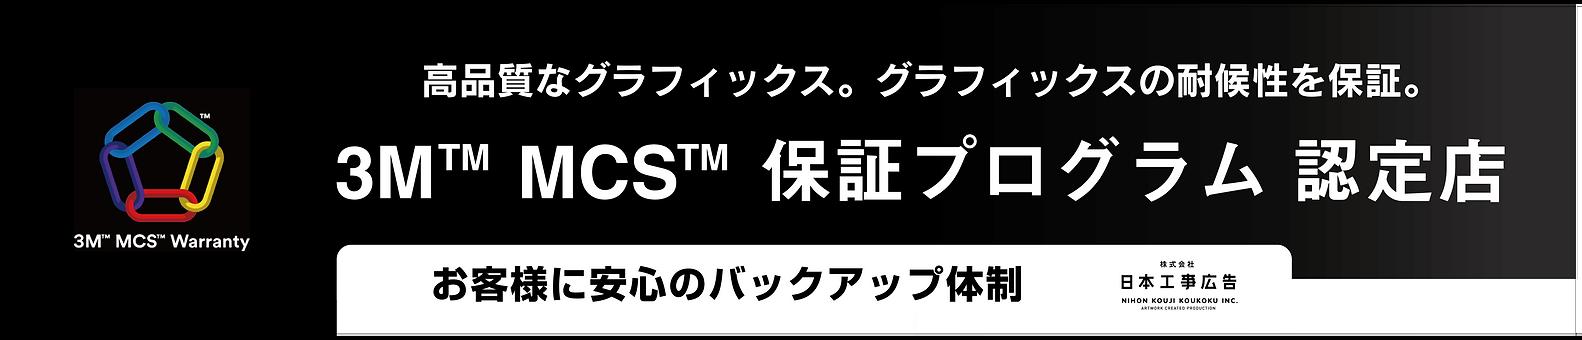 3MMCS保証_NKKバナー.png